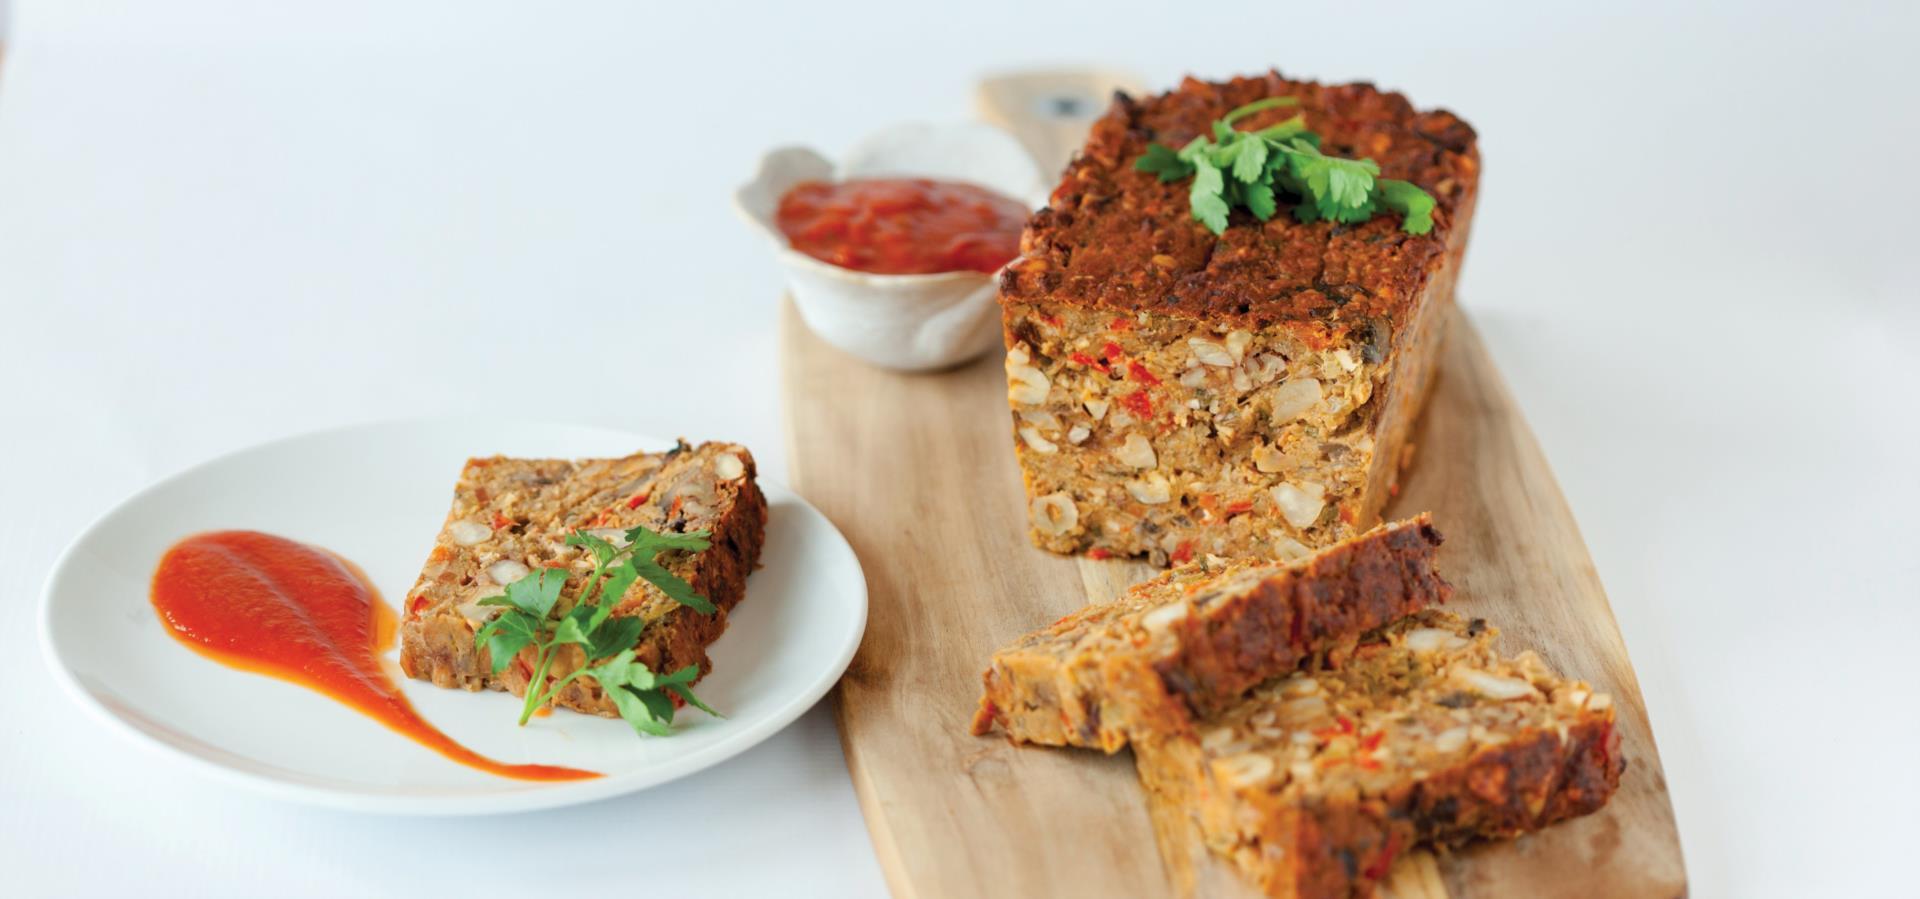 Vegetarian Cooking with Siemens 'hands-on workshops'